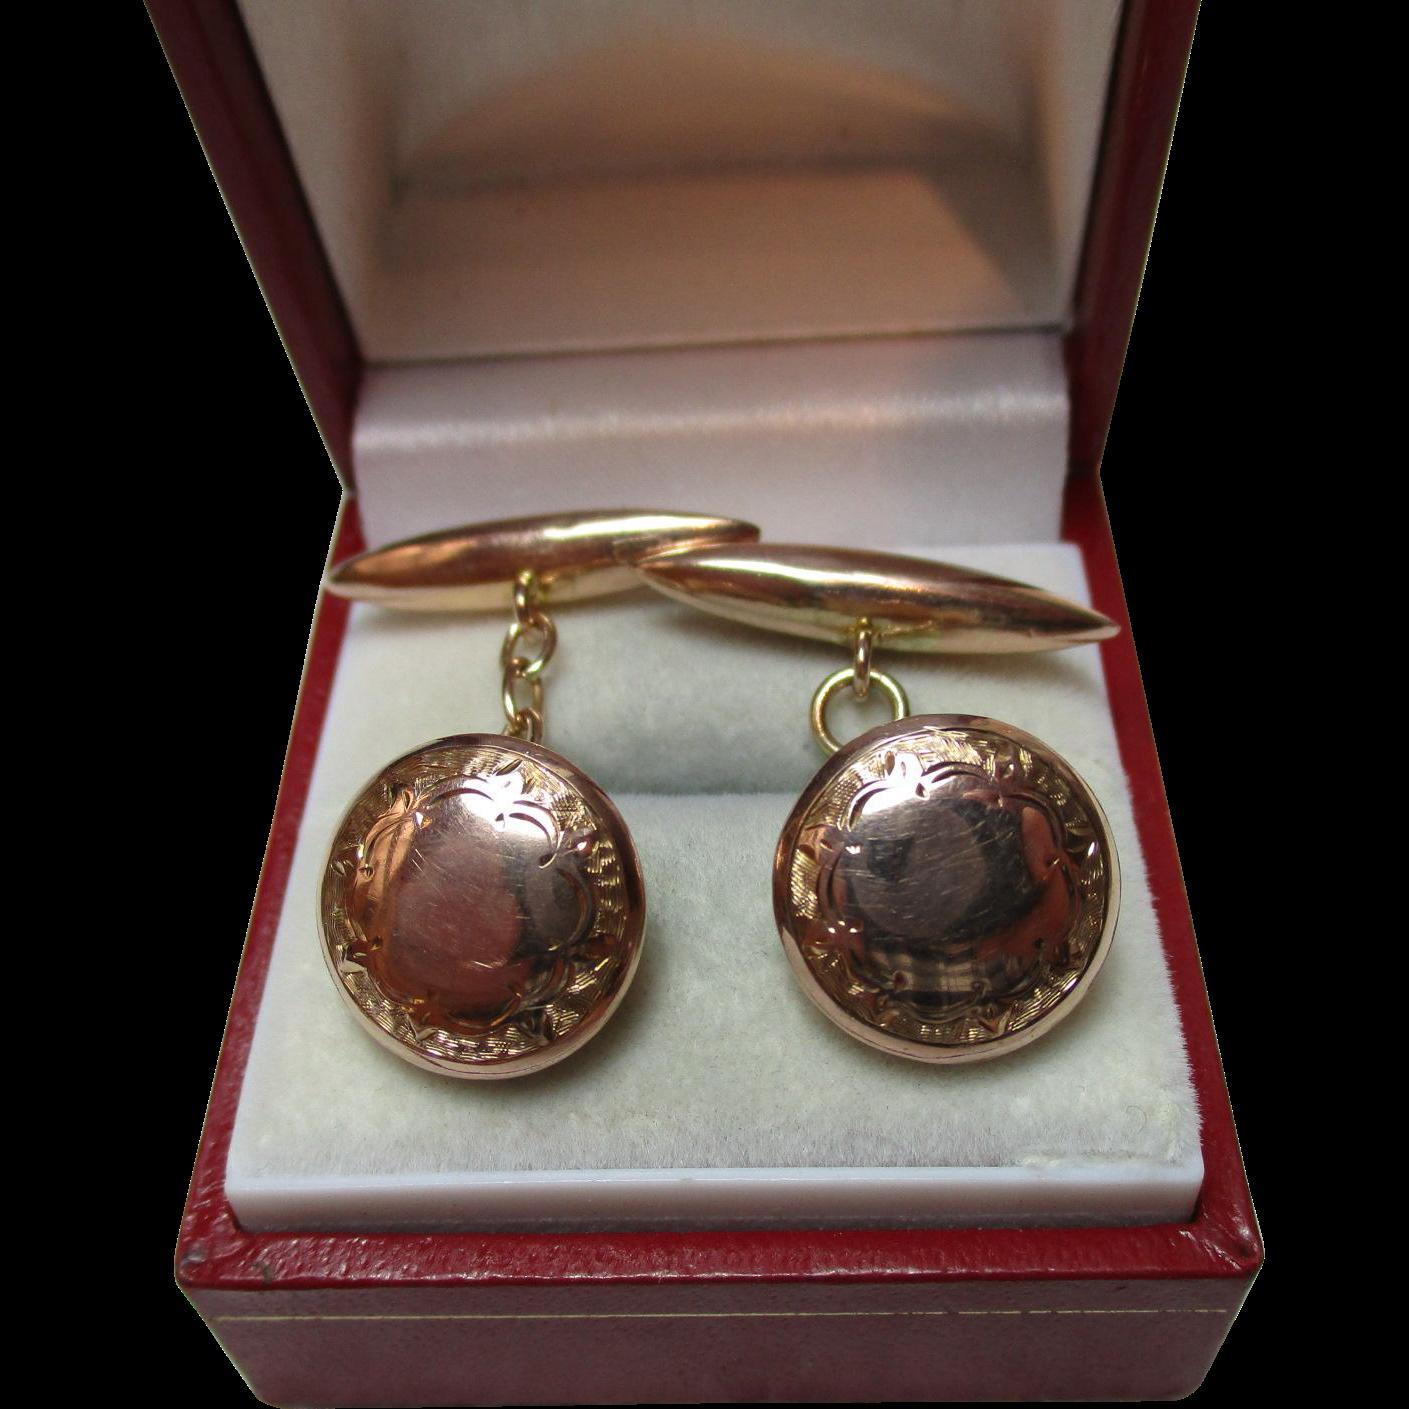 Gents' Decorative Antique 9ct Rose Gold 'Torpedo + Button' Chain-link Cufflinks{3.6 Grams}